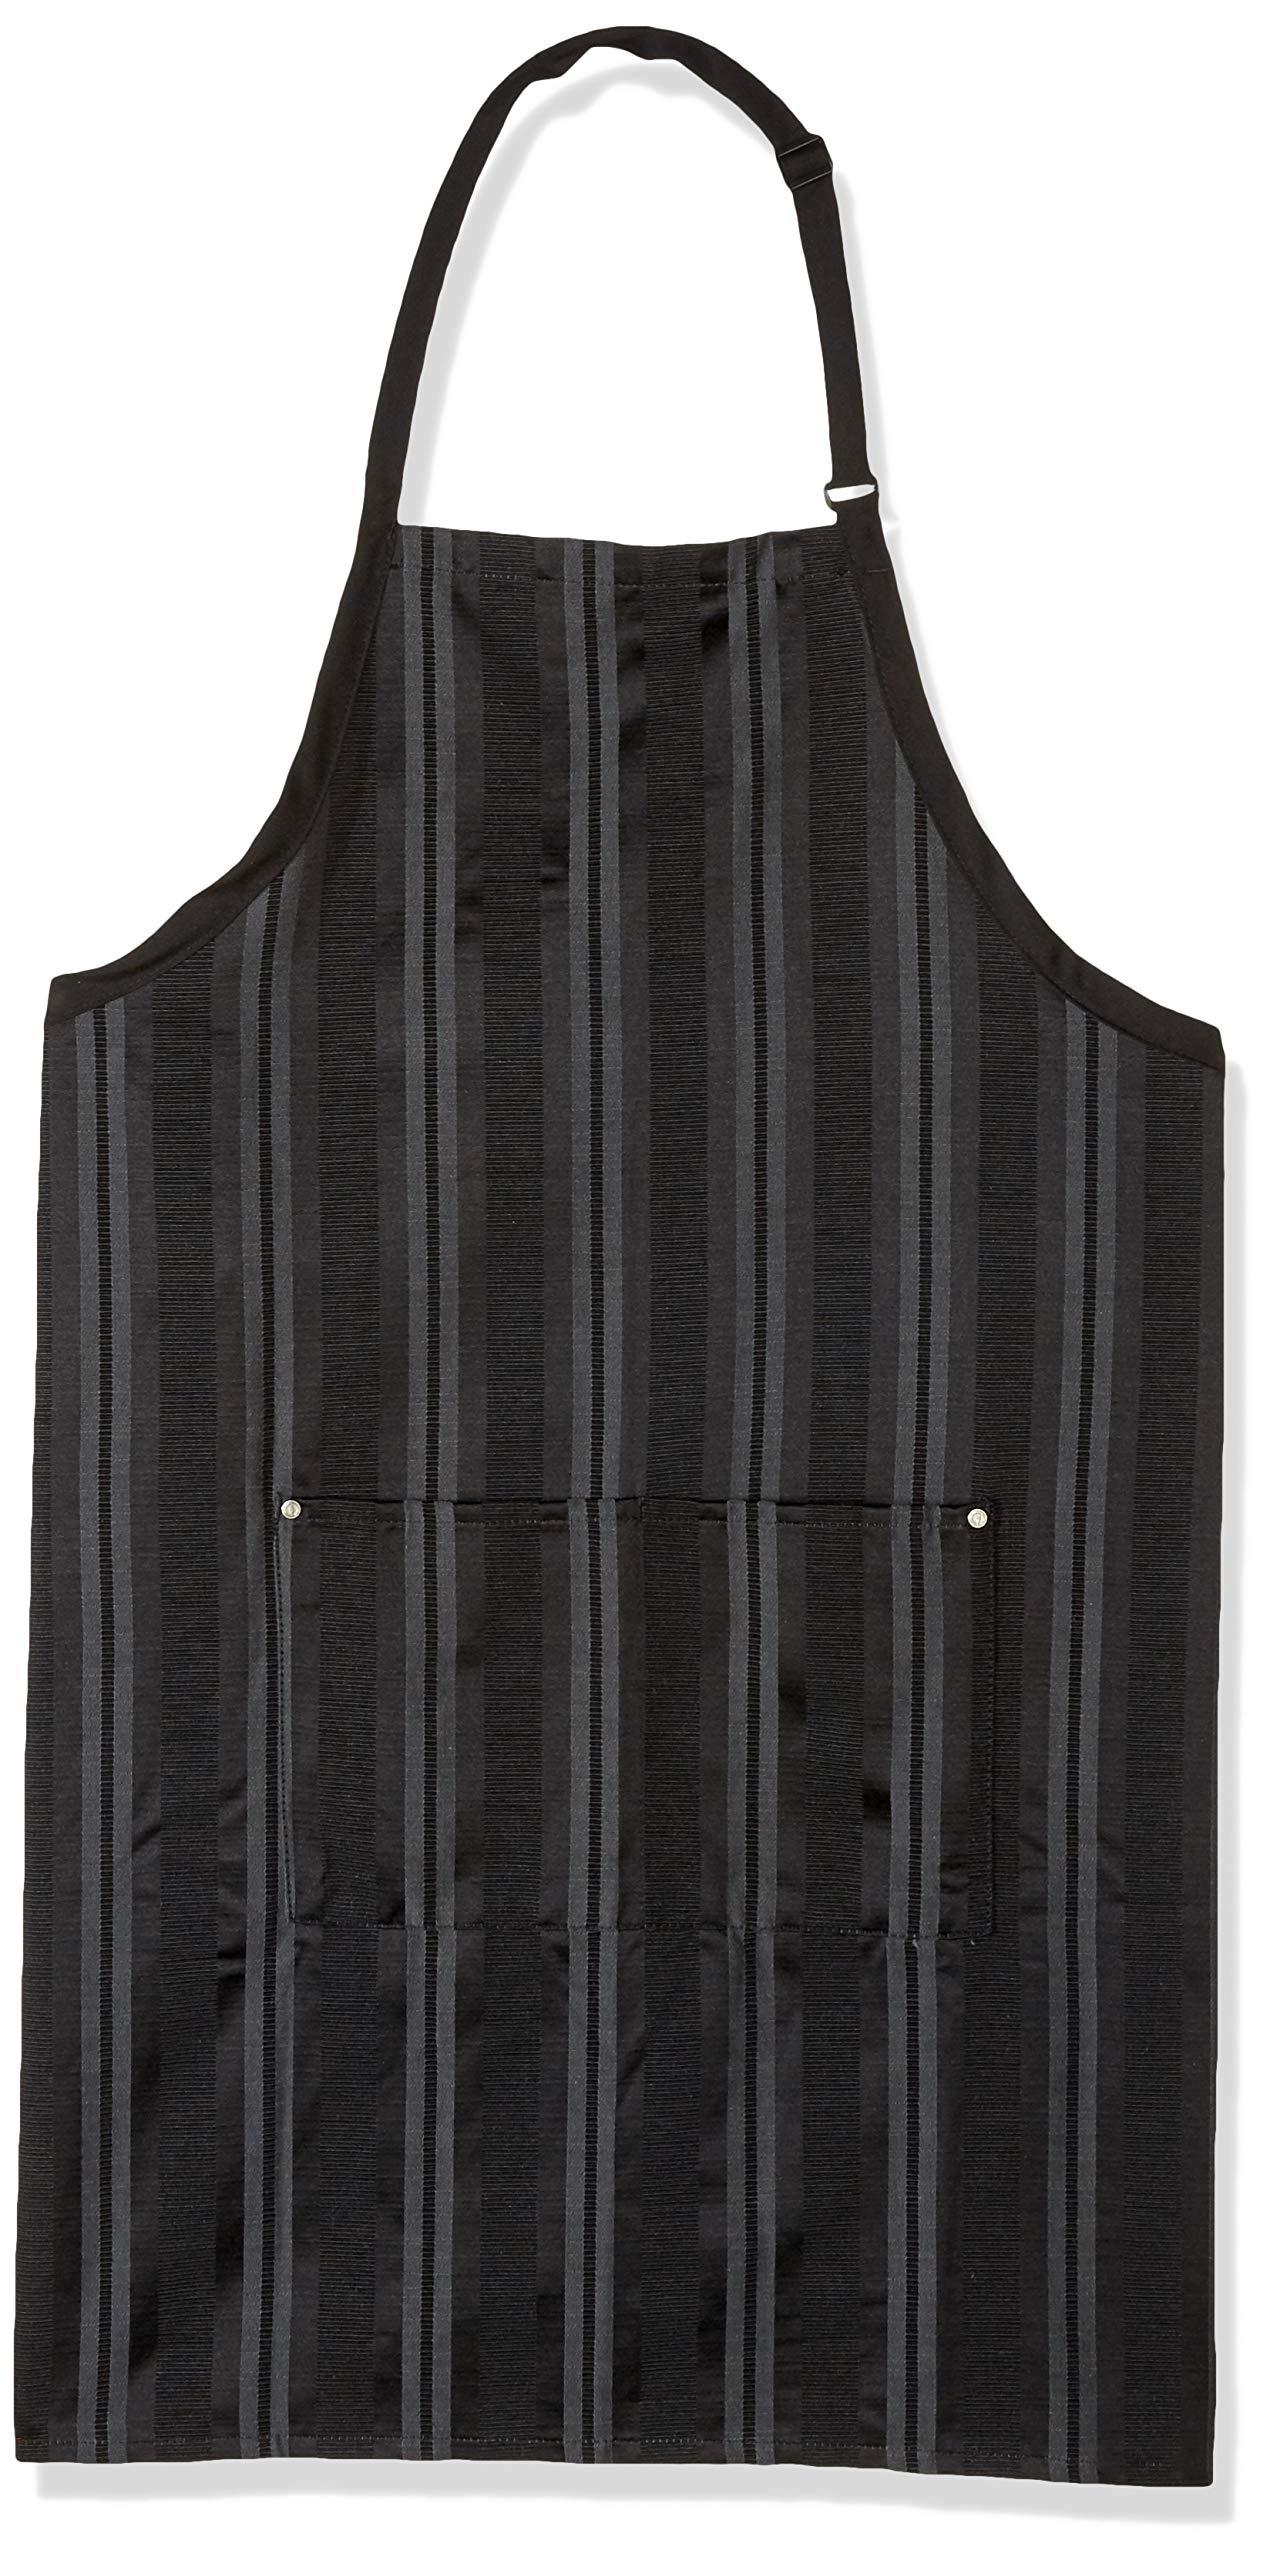 Chef Works Unisex Presdio Bib Apron, Black/Gray, One Size by Chef Works